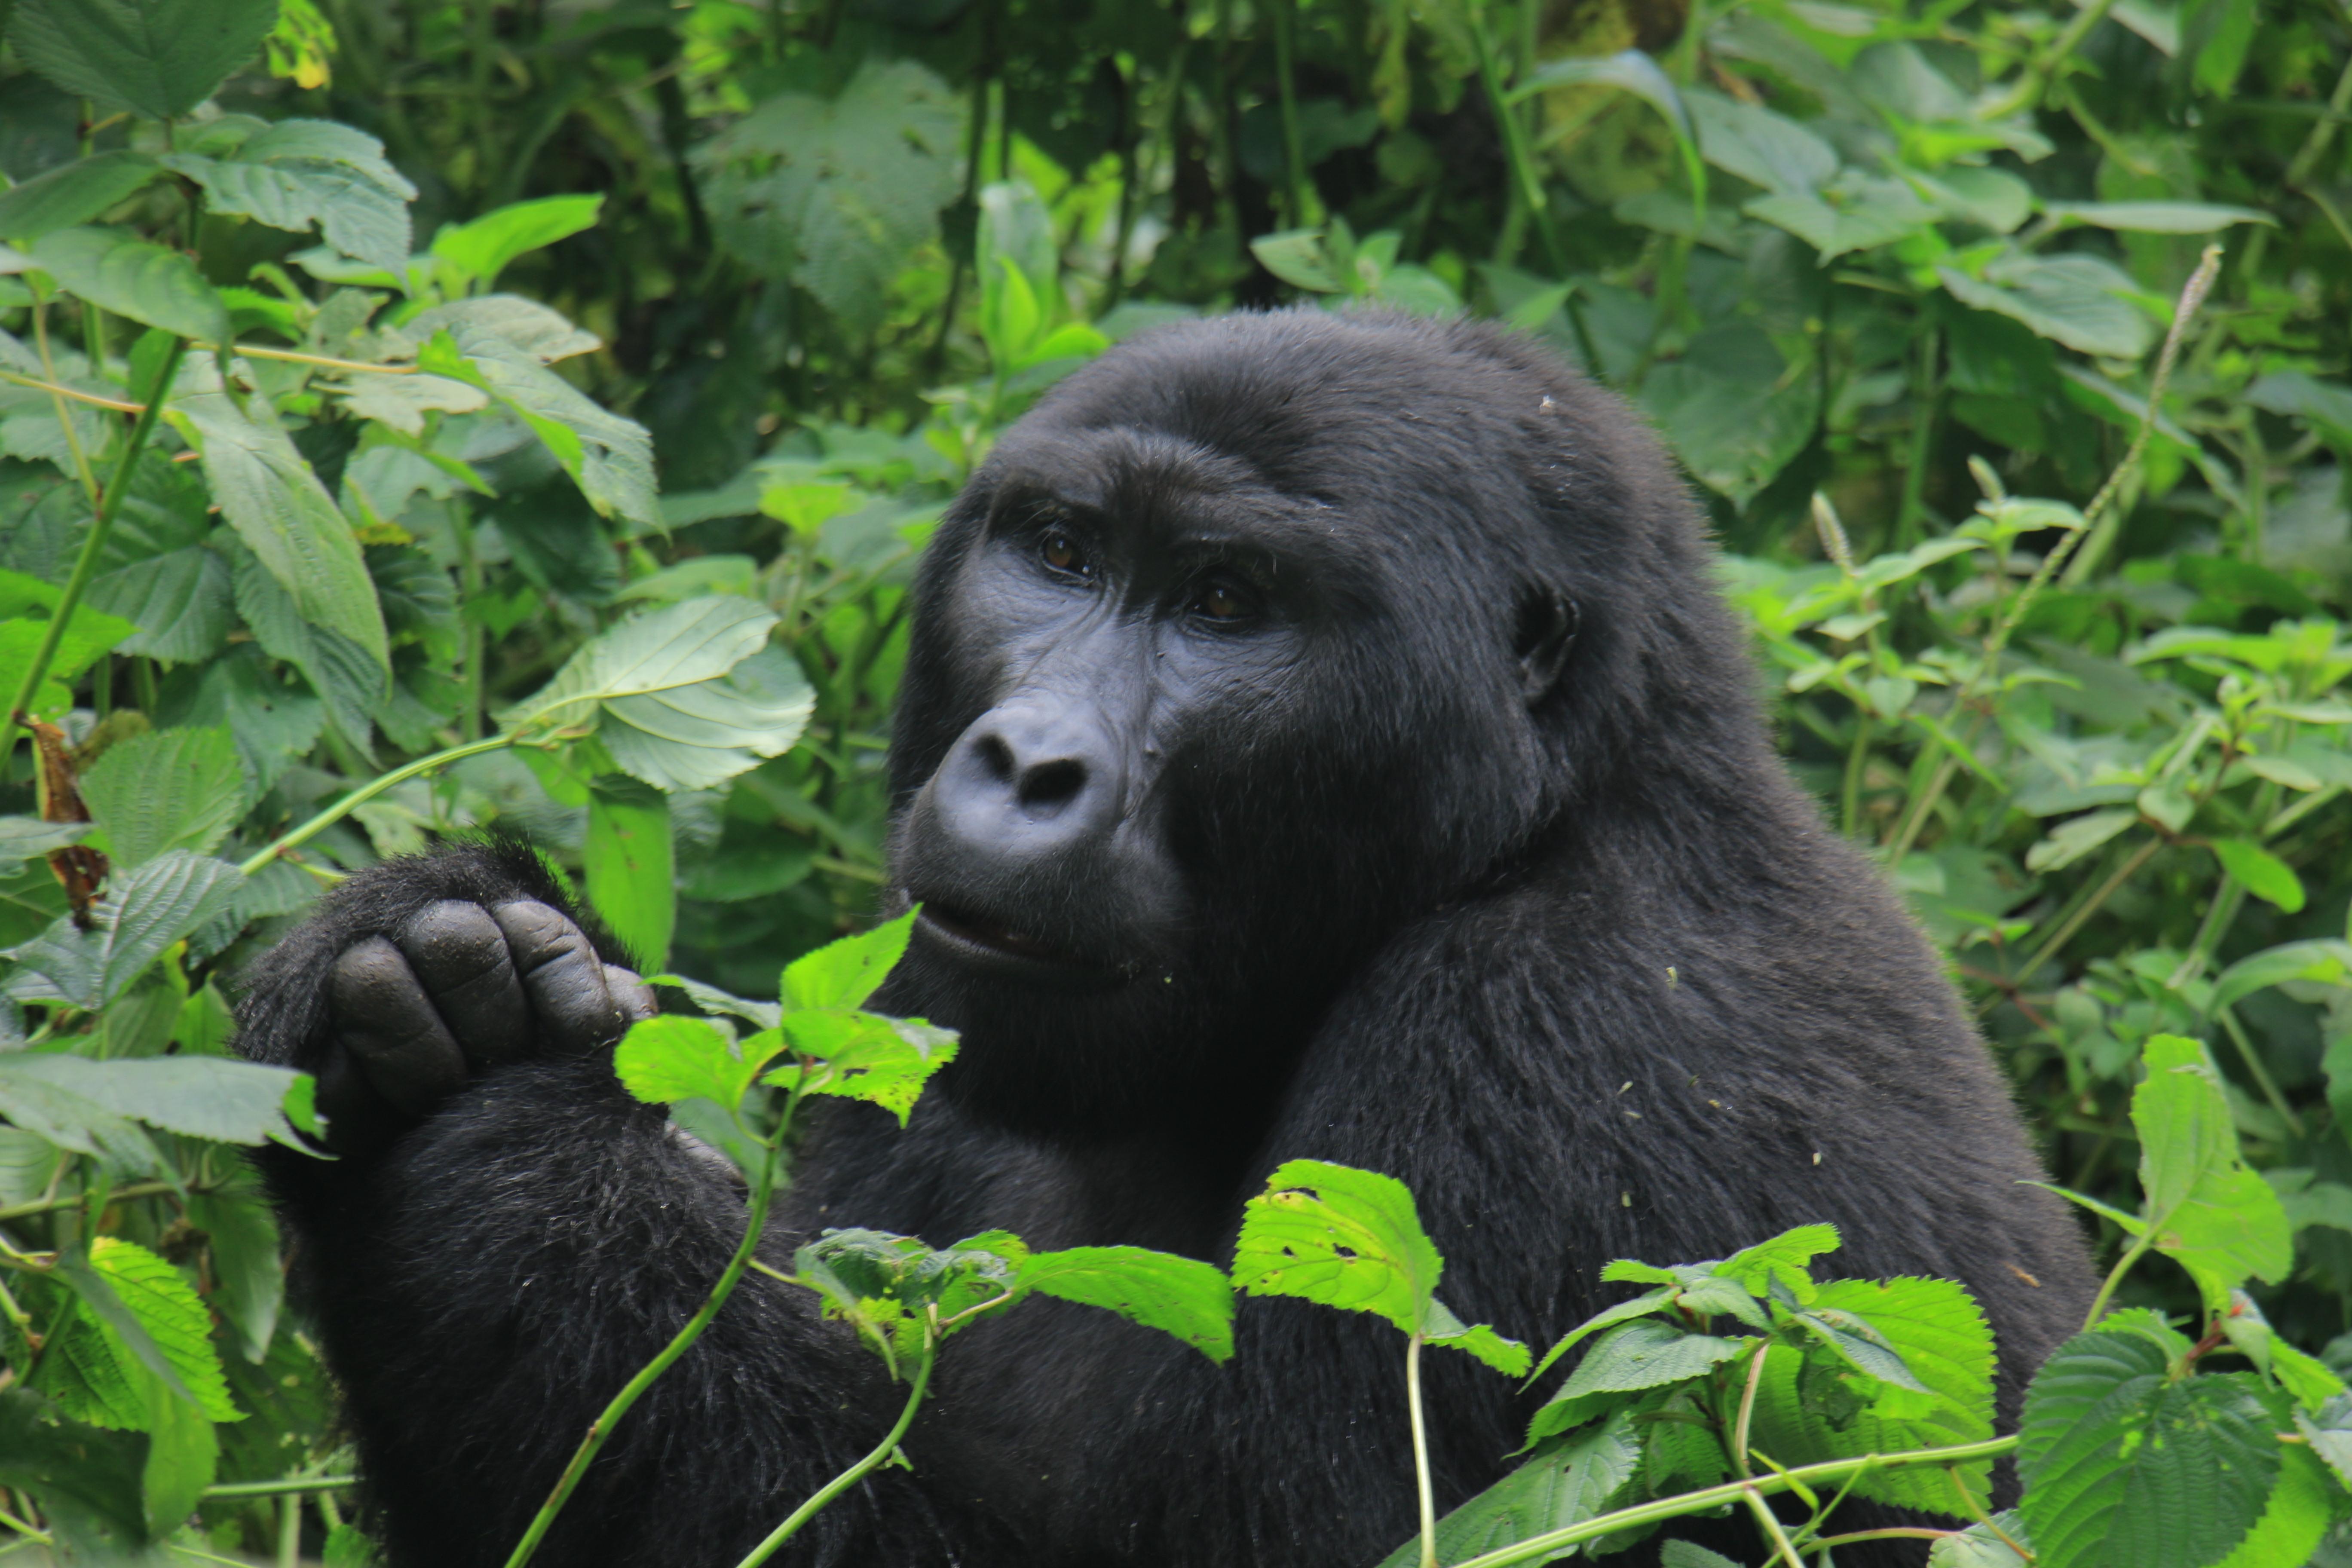 10 Days Road Trip to Encounter Gorillas & Wildlife in Uganda Tour 1